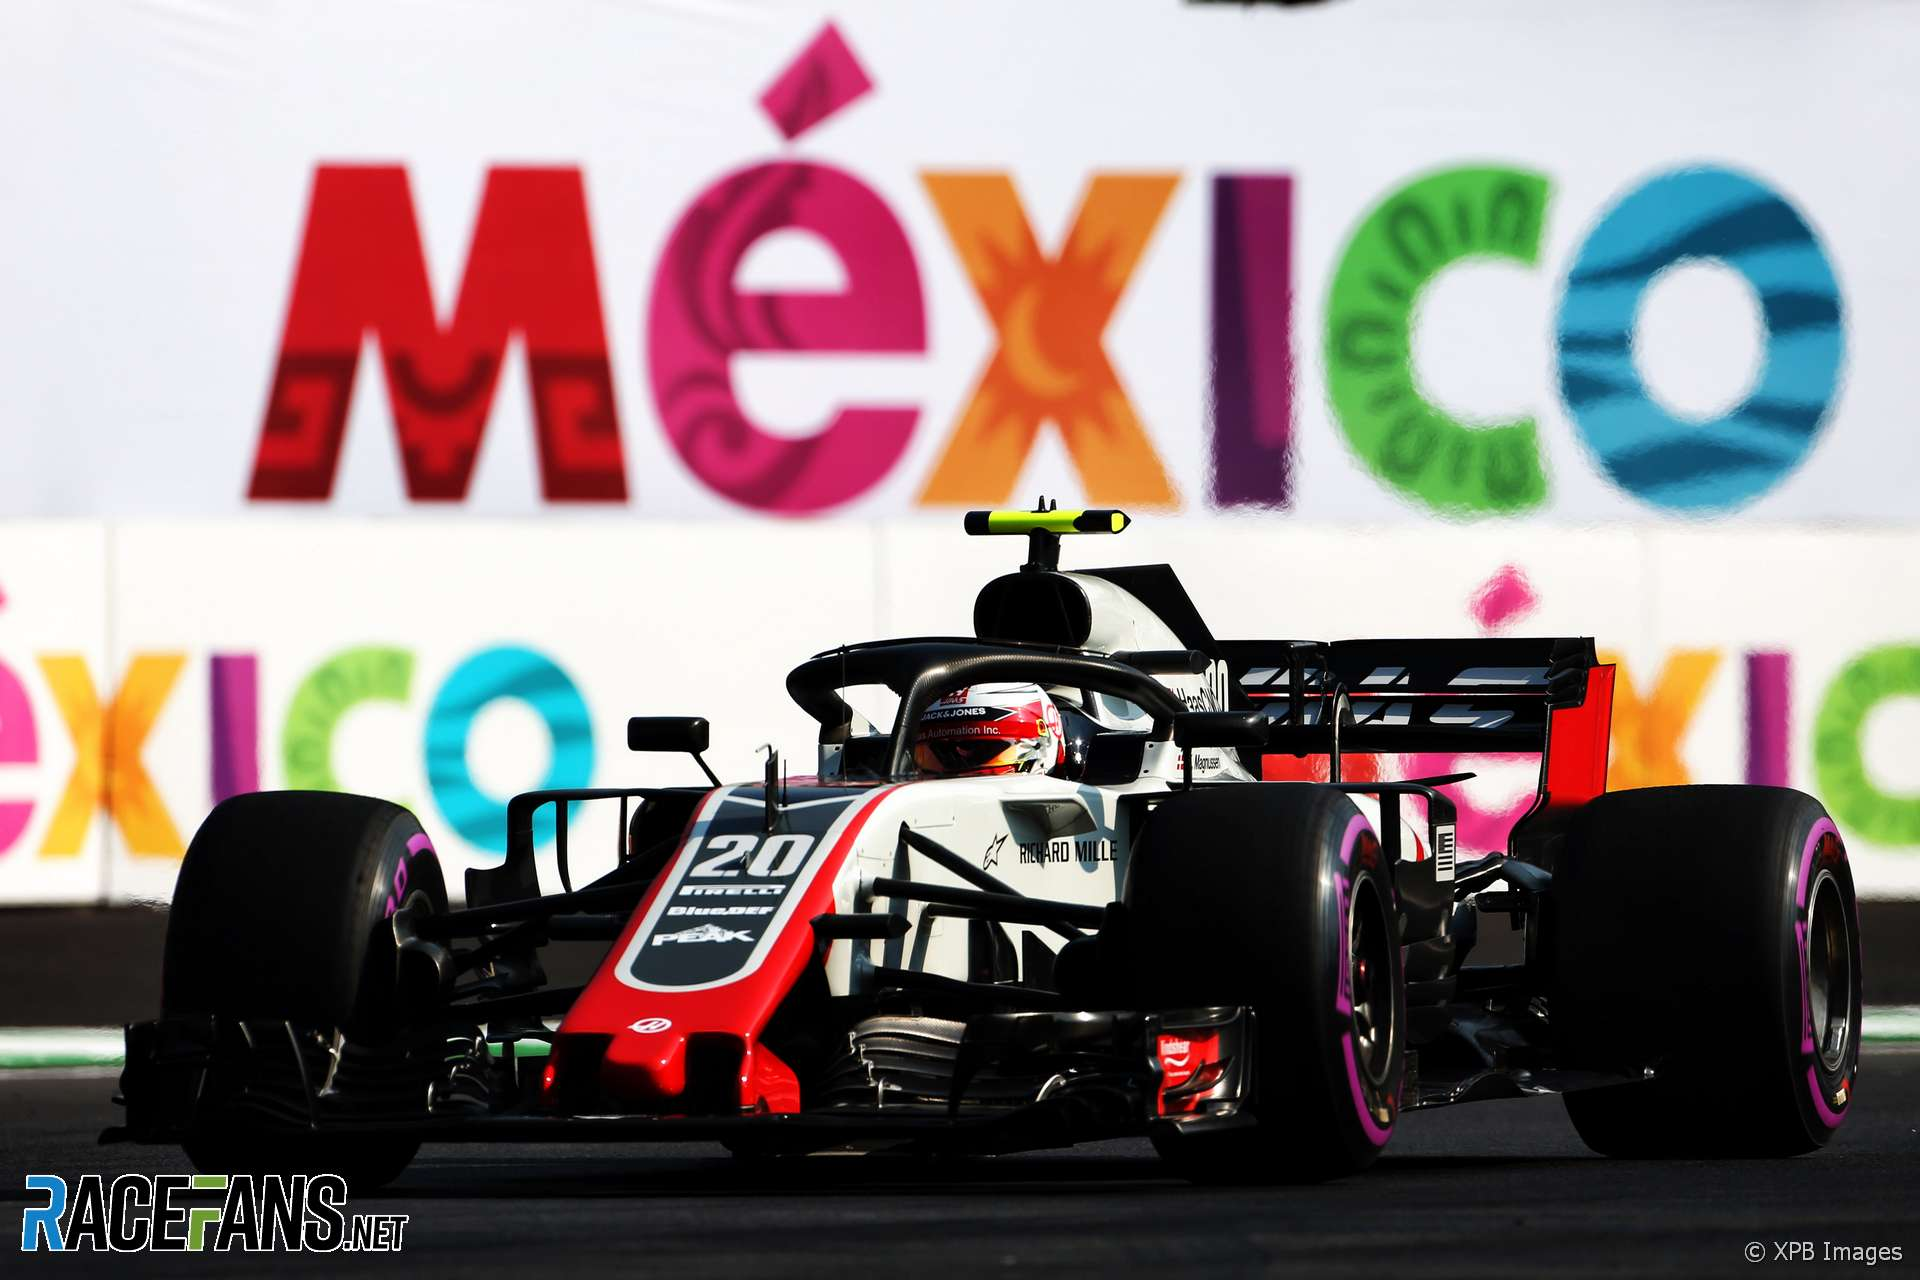 Kevin Magnussen, Haas, Autodromo Hermanos Rodriguez, 2018